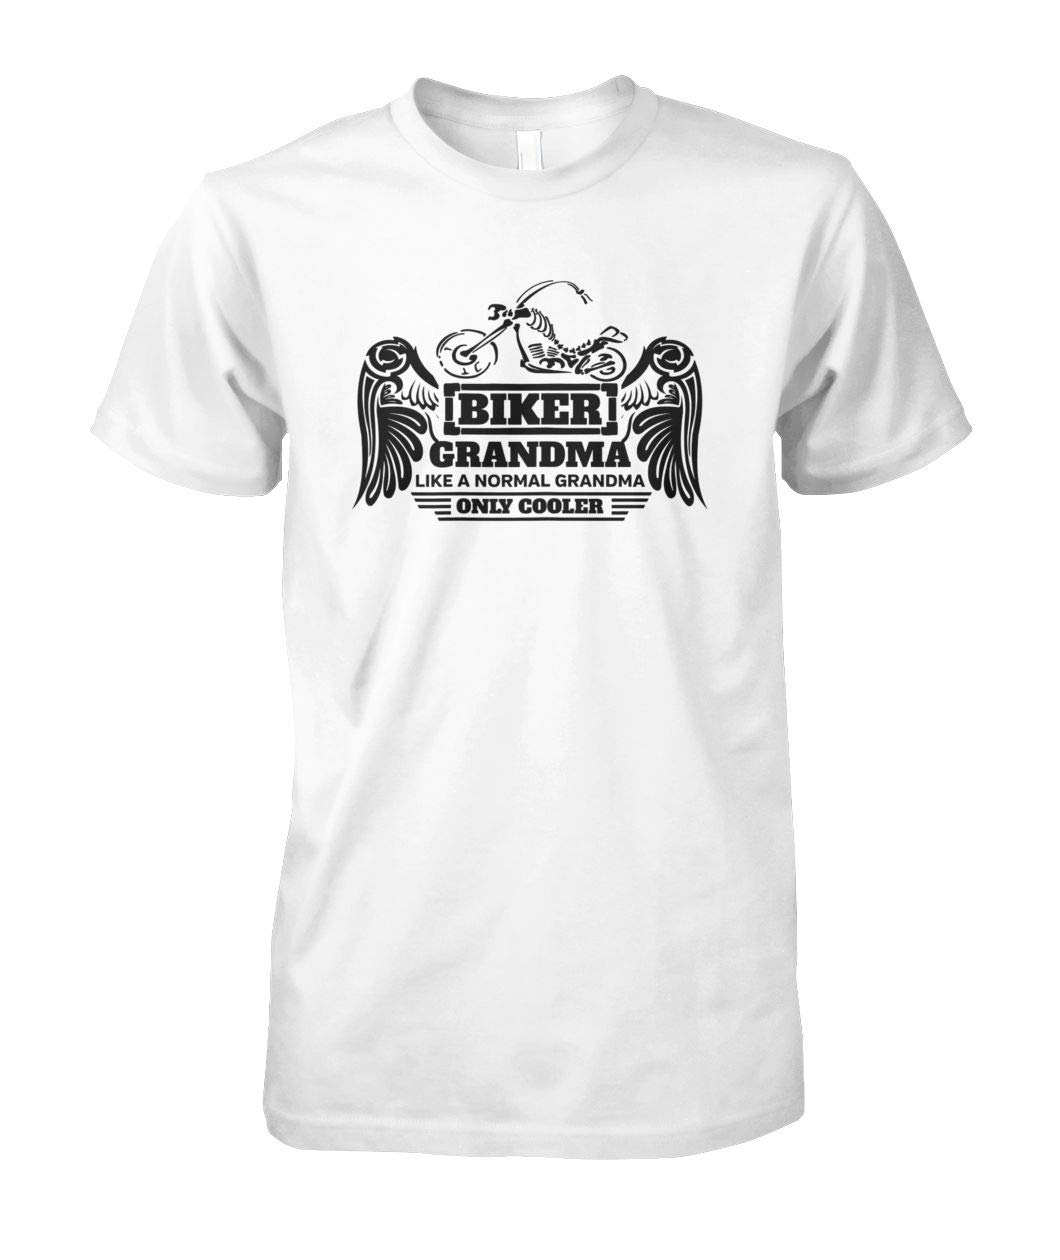 Sweatshirt For Men Women Ladies 458. Womens Biker Grandma Tshirt Gift Idea for a Motorcycle Granny Short Sleeves Shirt Unisex Hoodie